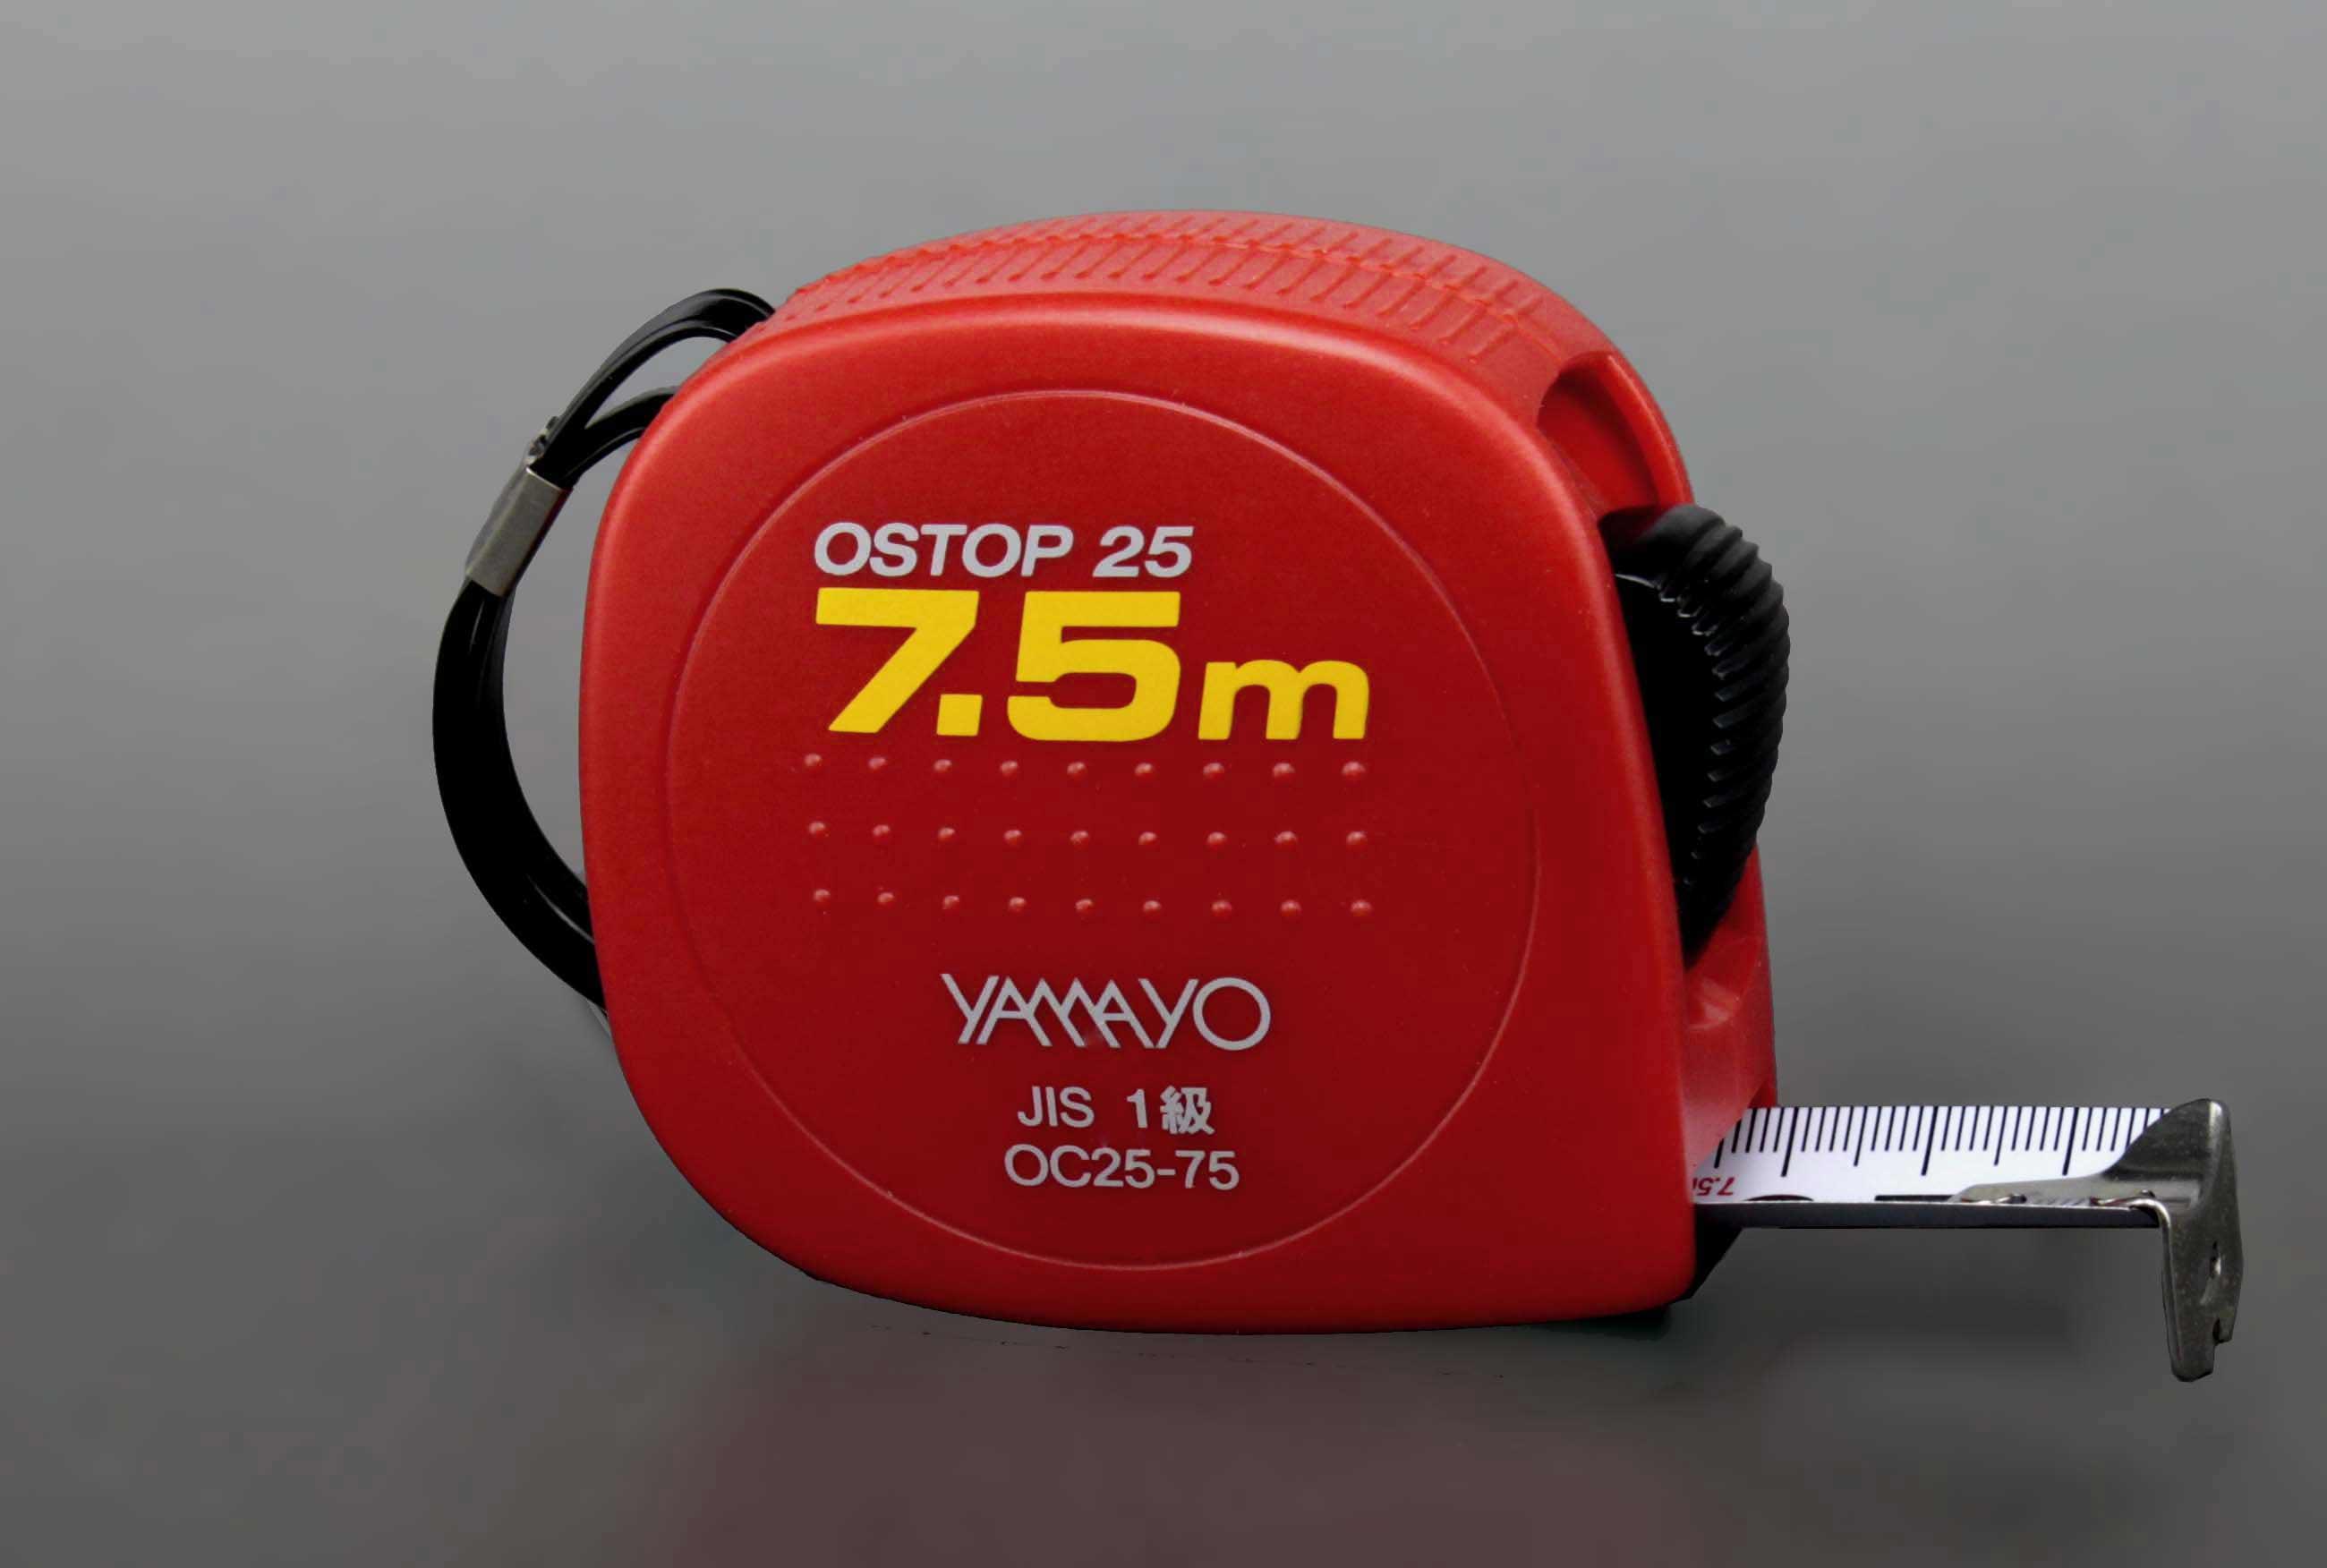 OC25-75